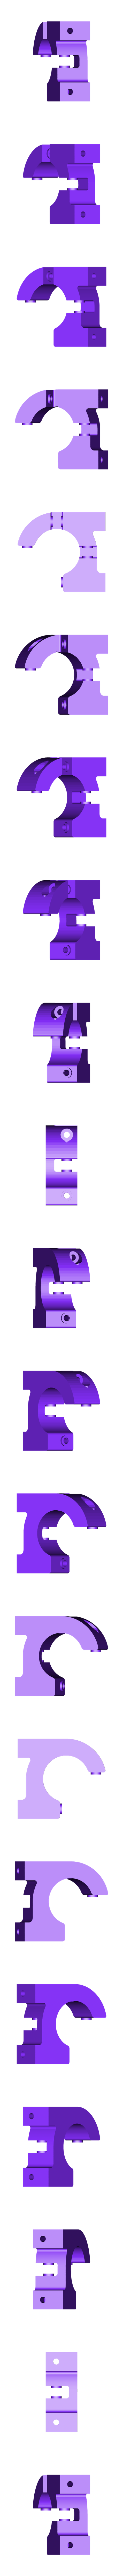 bearing01.STL Download free STL file Mammut - Giant printer. • 3D printable model, tahustvedt